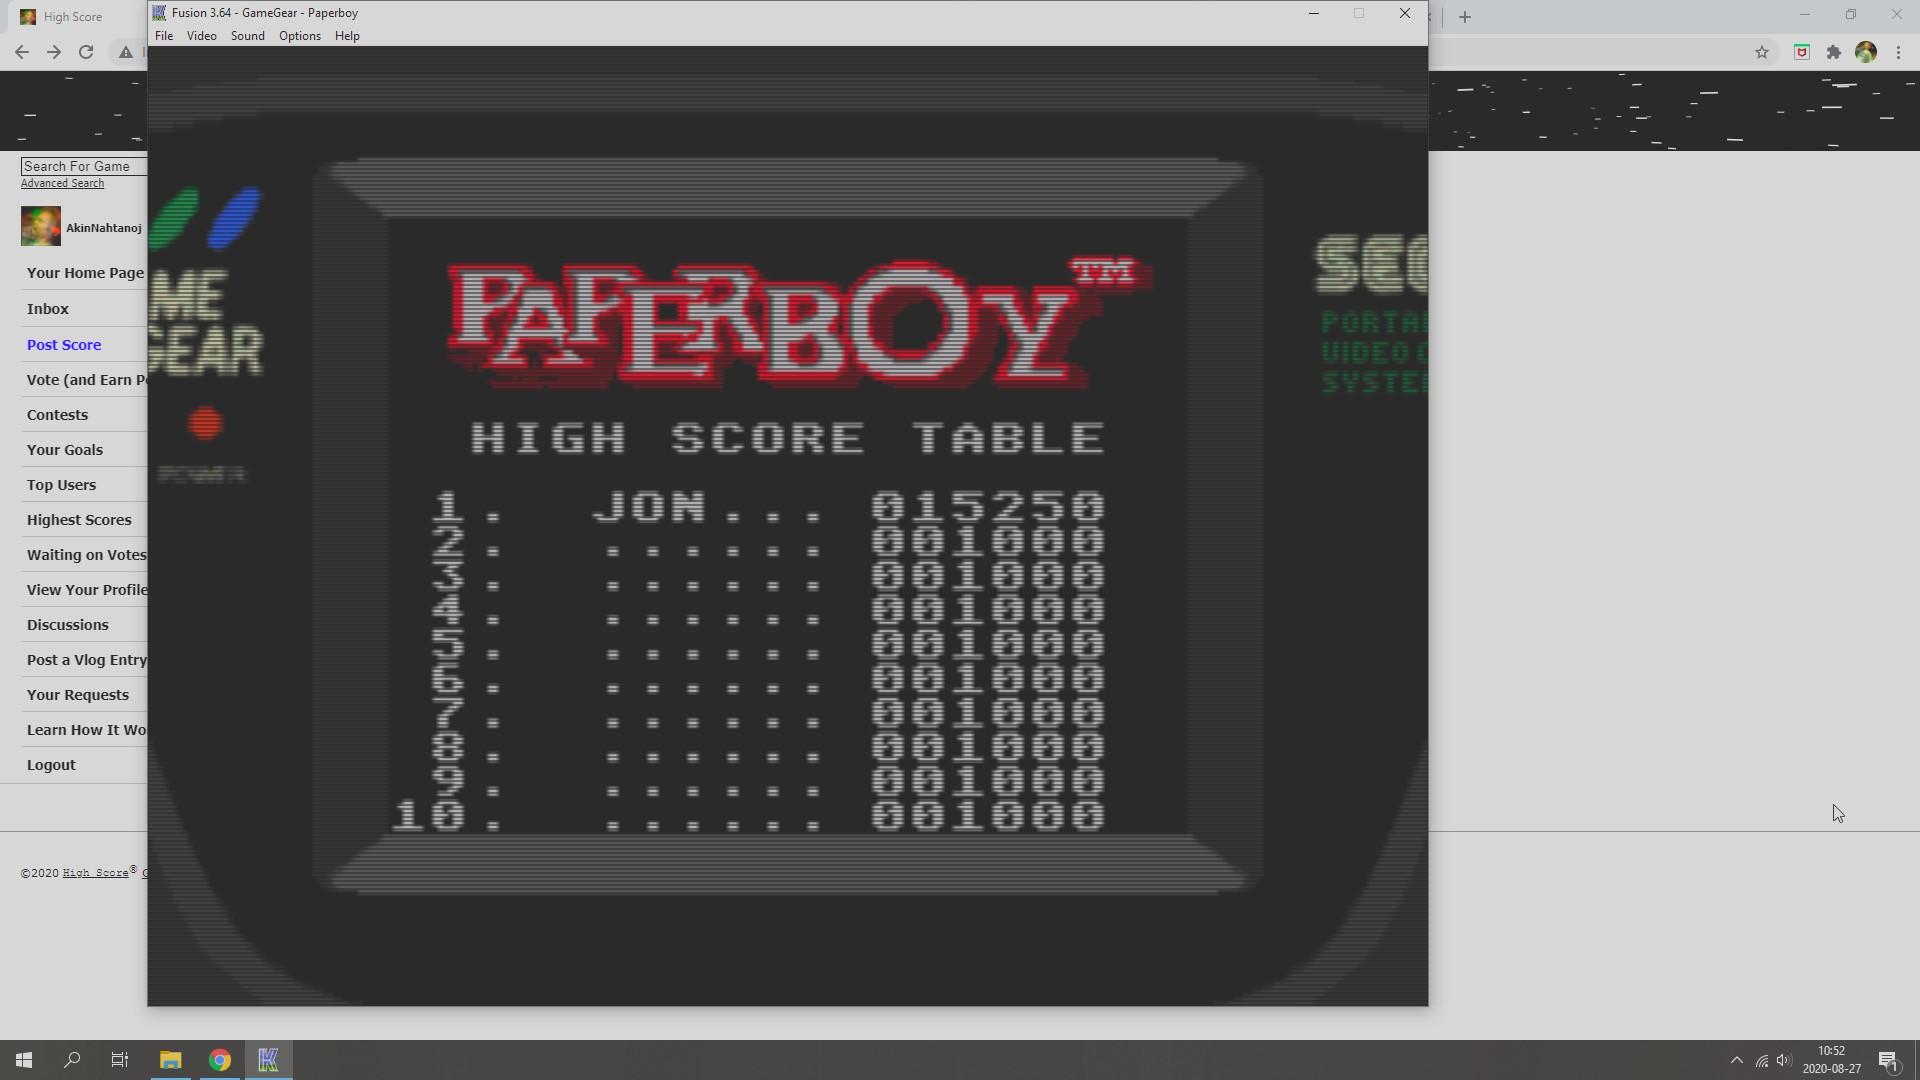 AkinNahtanoj: Paperboy [Easy Street] (Sega Game Gear Emulated) 15,250 points on 2020-08-27 04:01:33